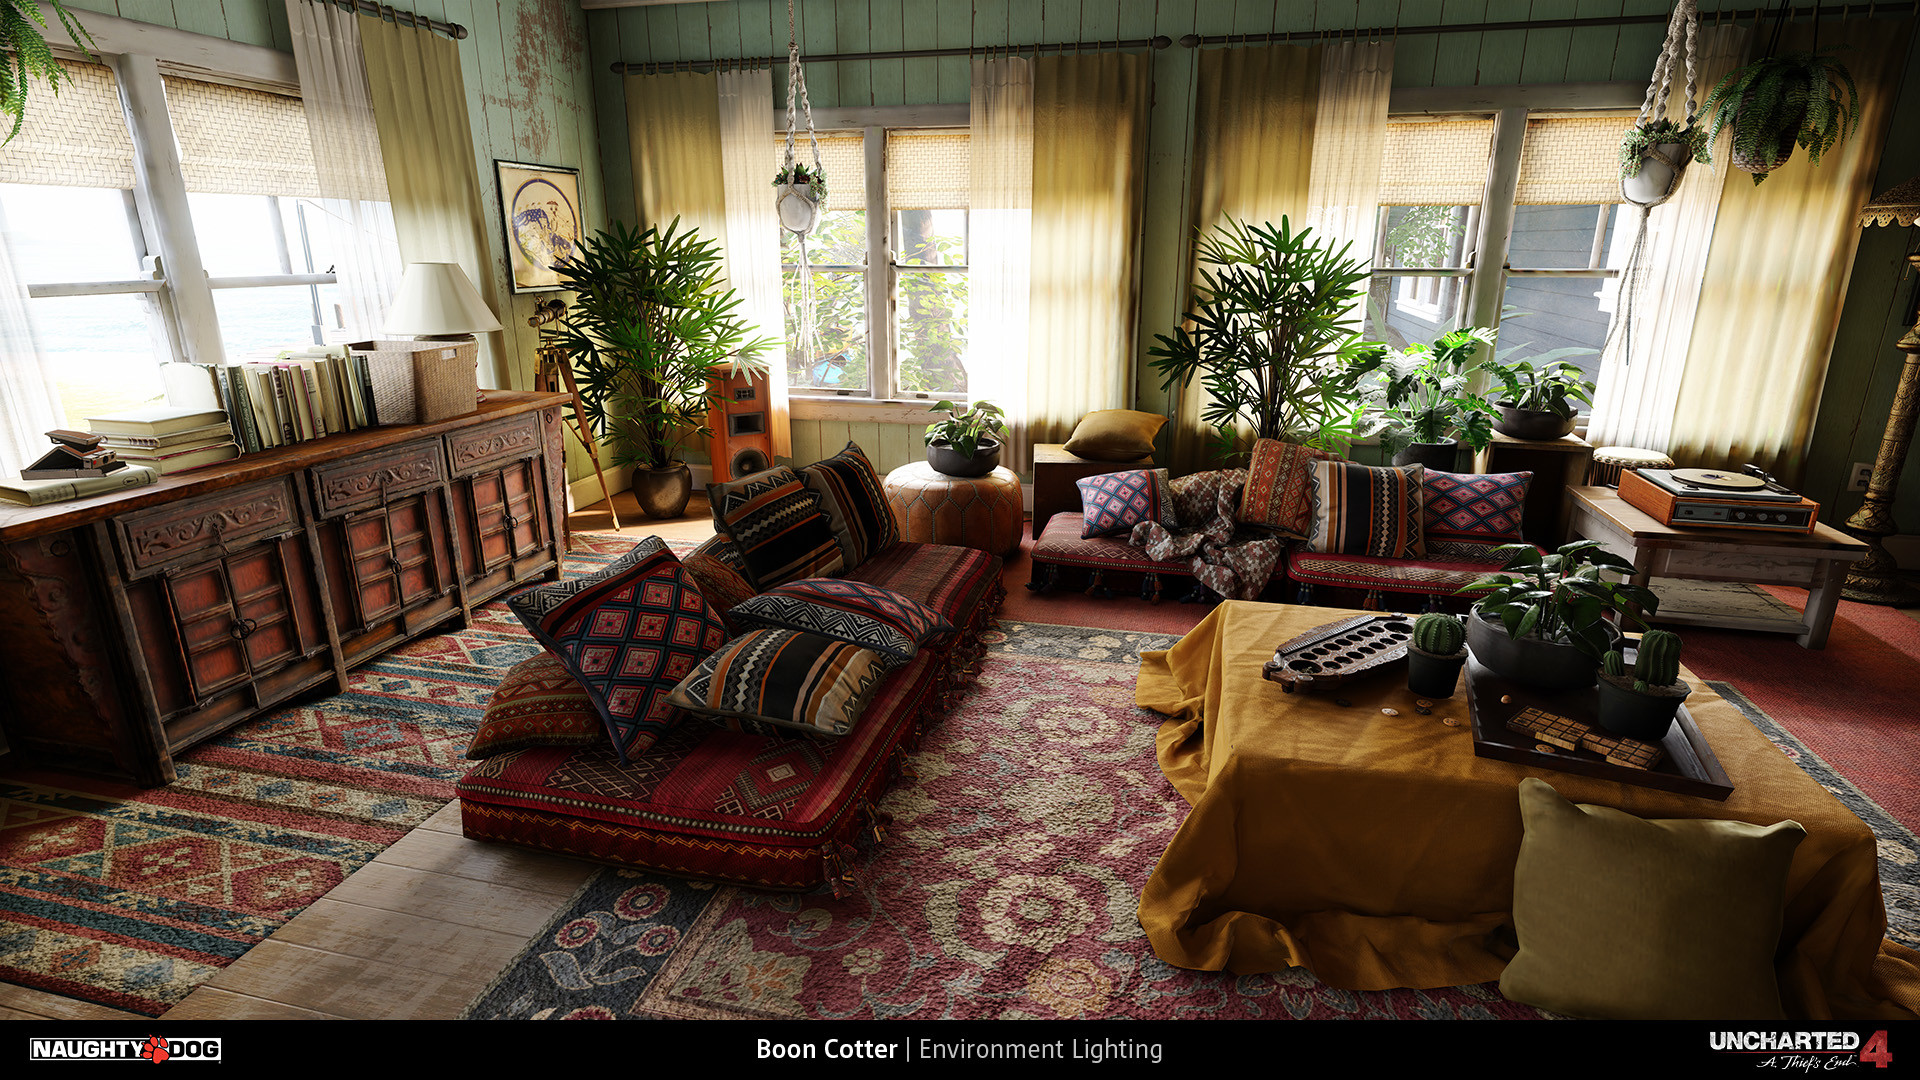 boon-cotter-epilogue-livingroom-01.jpg?1